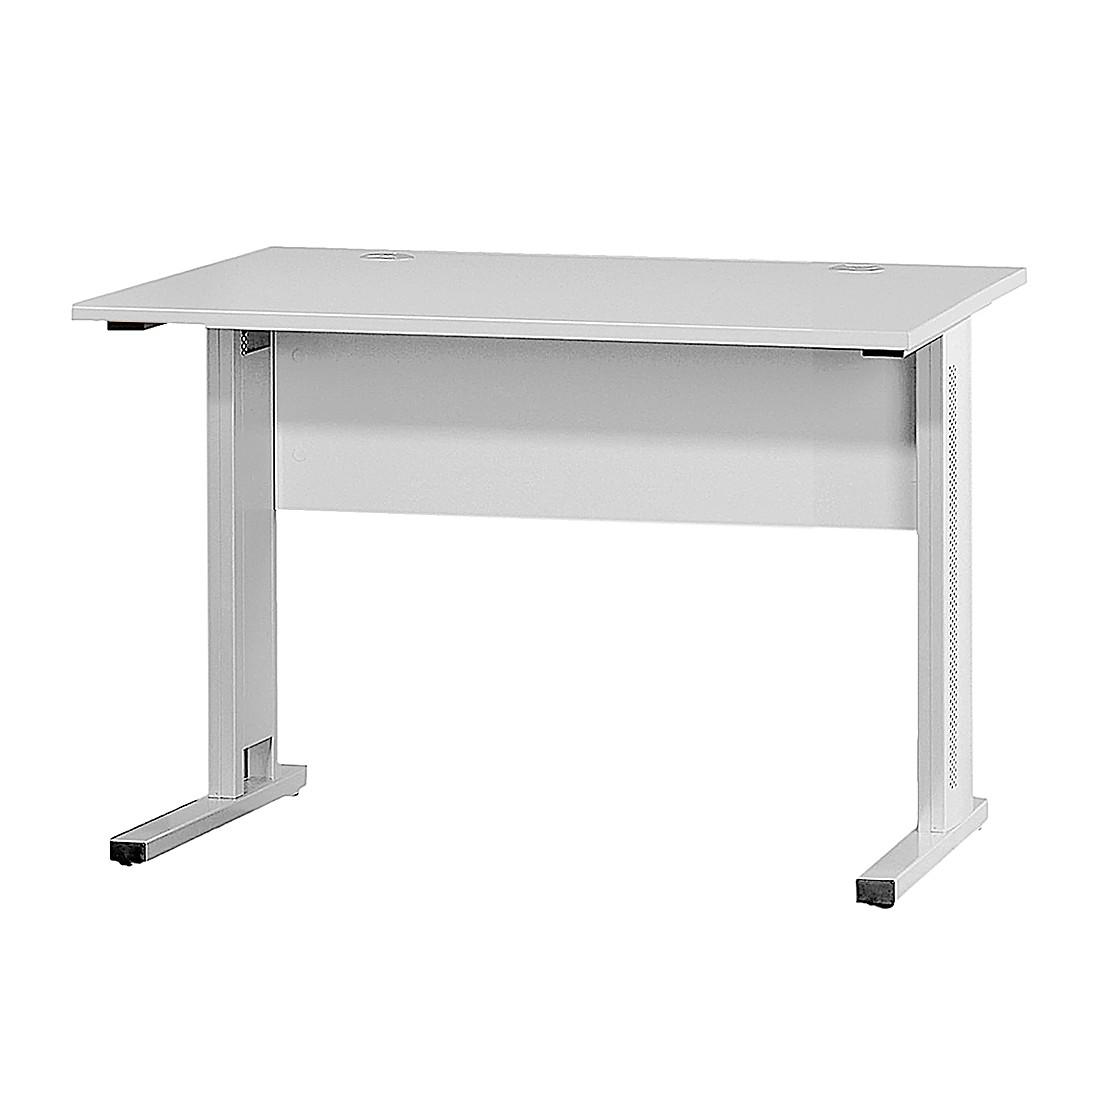 Home 24 - Bureau techno speed i - gris - 120 x 80 cm, röhr